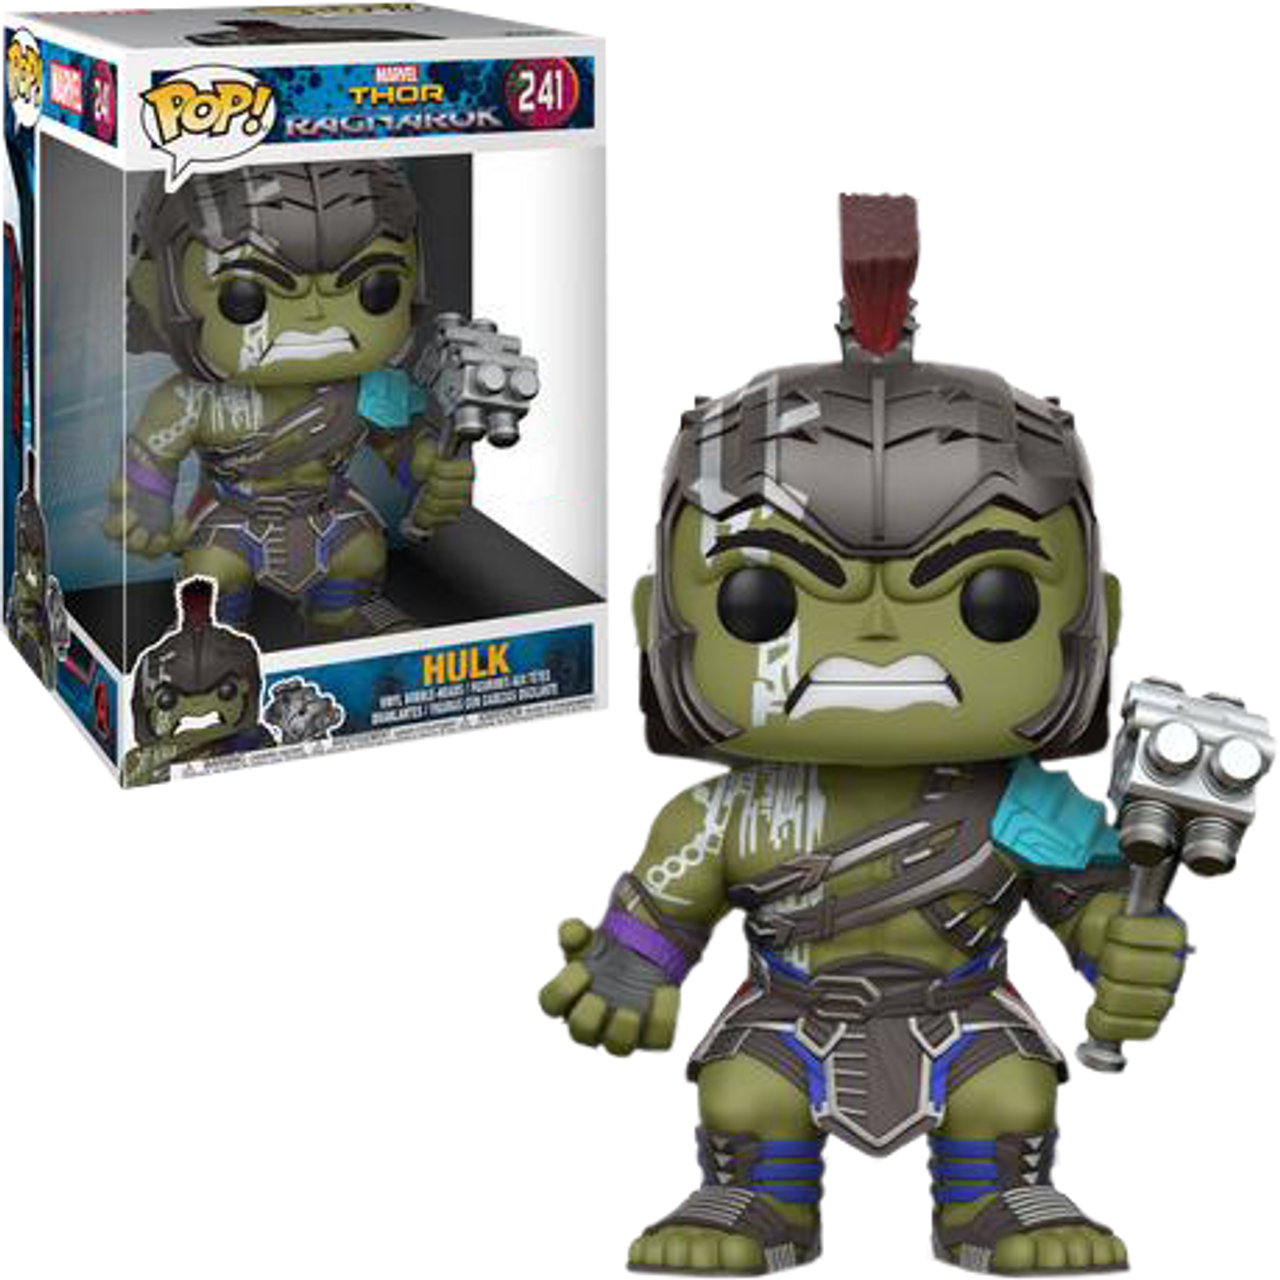 Thor 3 Ragnarok Hulk Gladiator 10 Pop Vinyl Figure